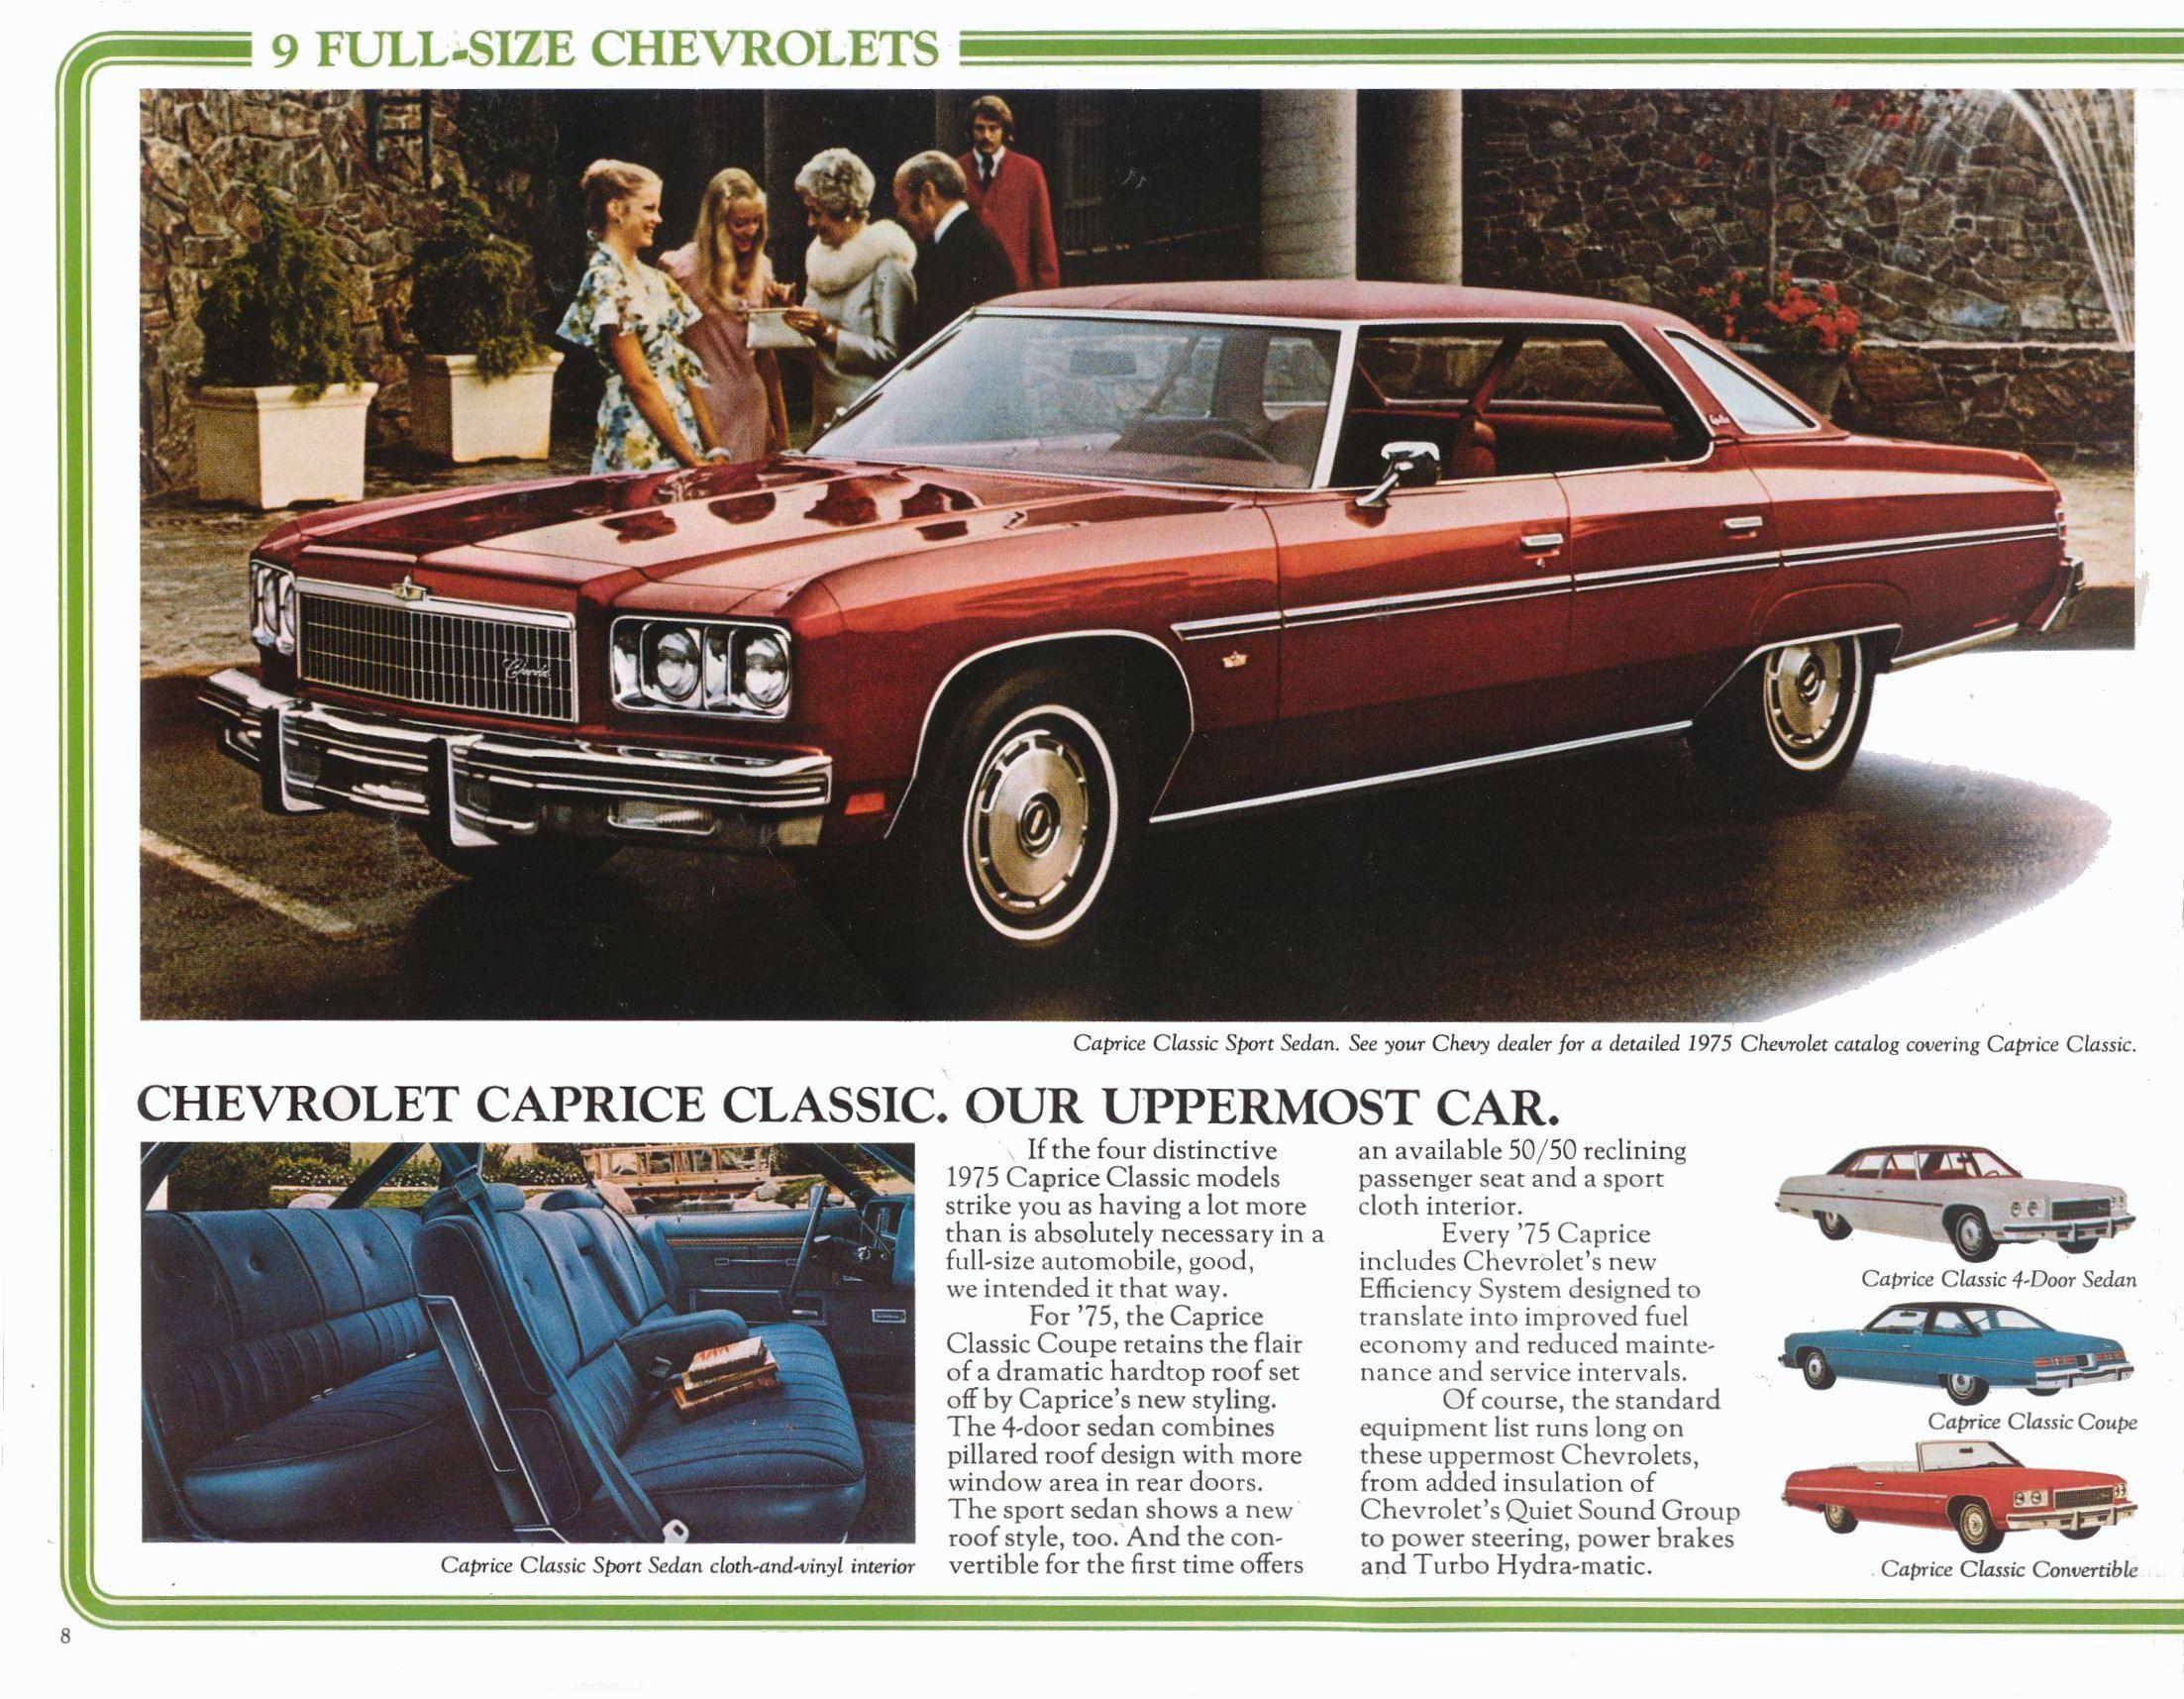 1975 Chevrolet Caprice Chevrolet Caprice Chevrolet Automobile